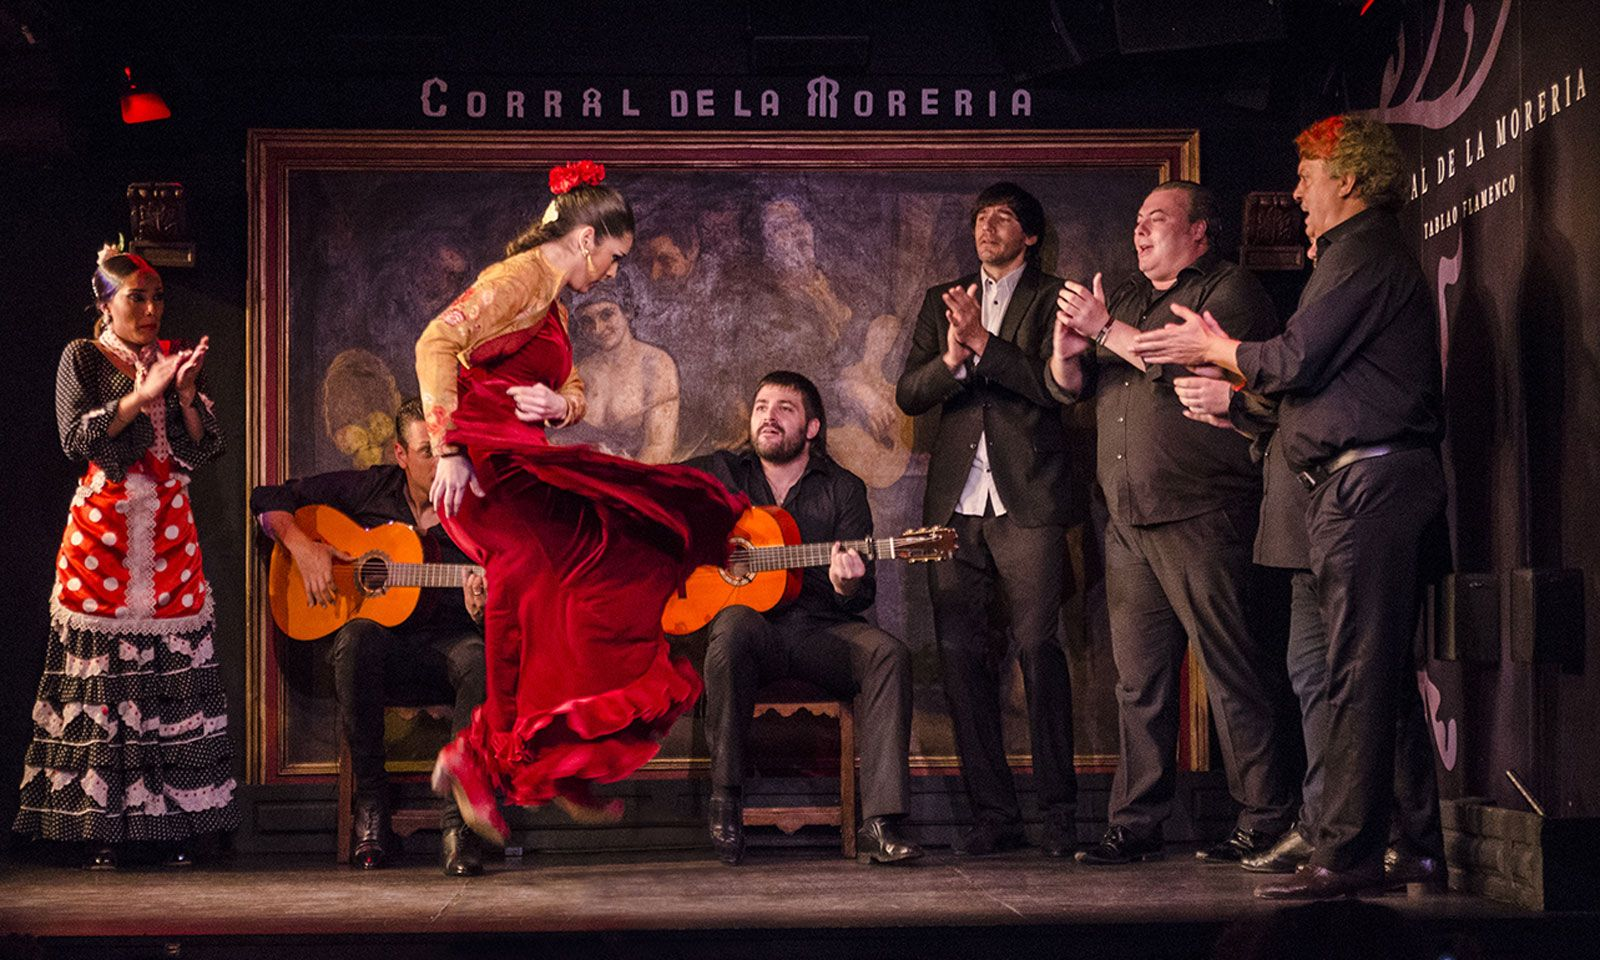 Flamenco-Aufführung im berühmten Corral de la Moreira.